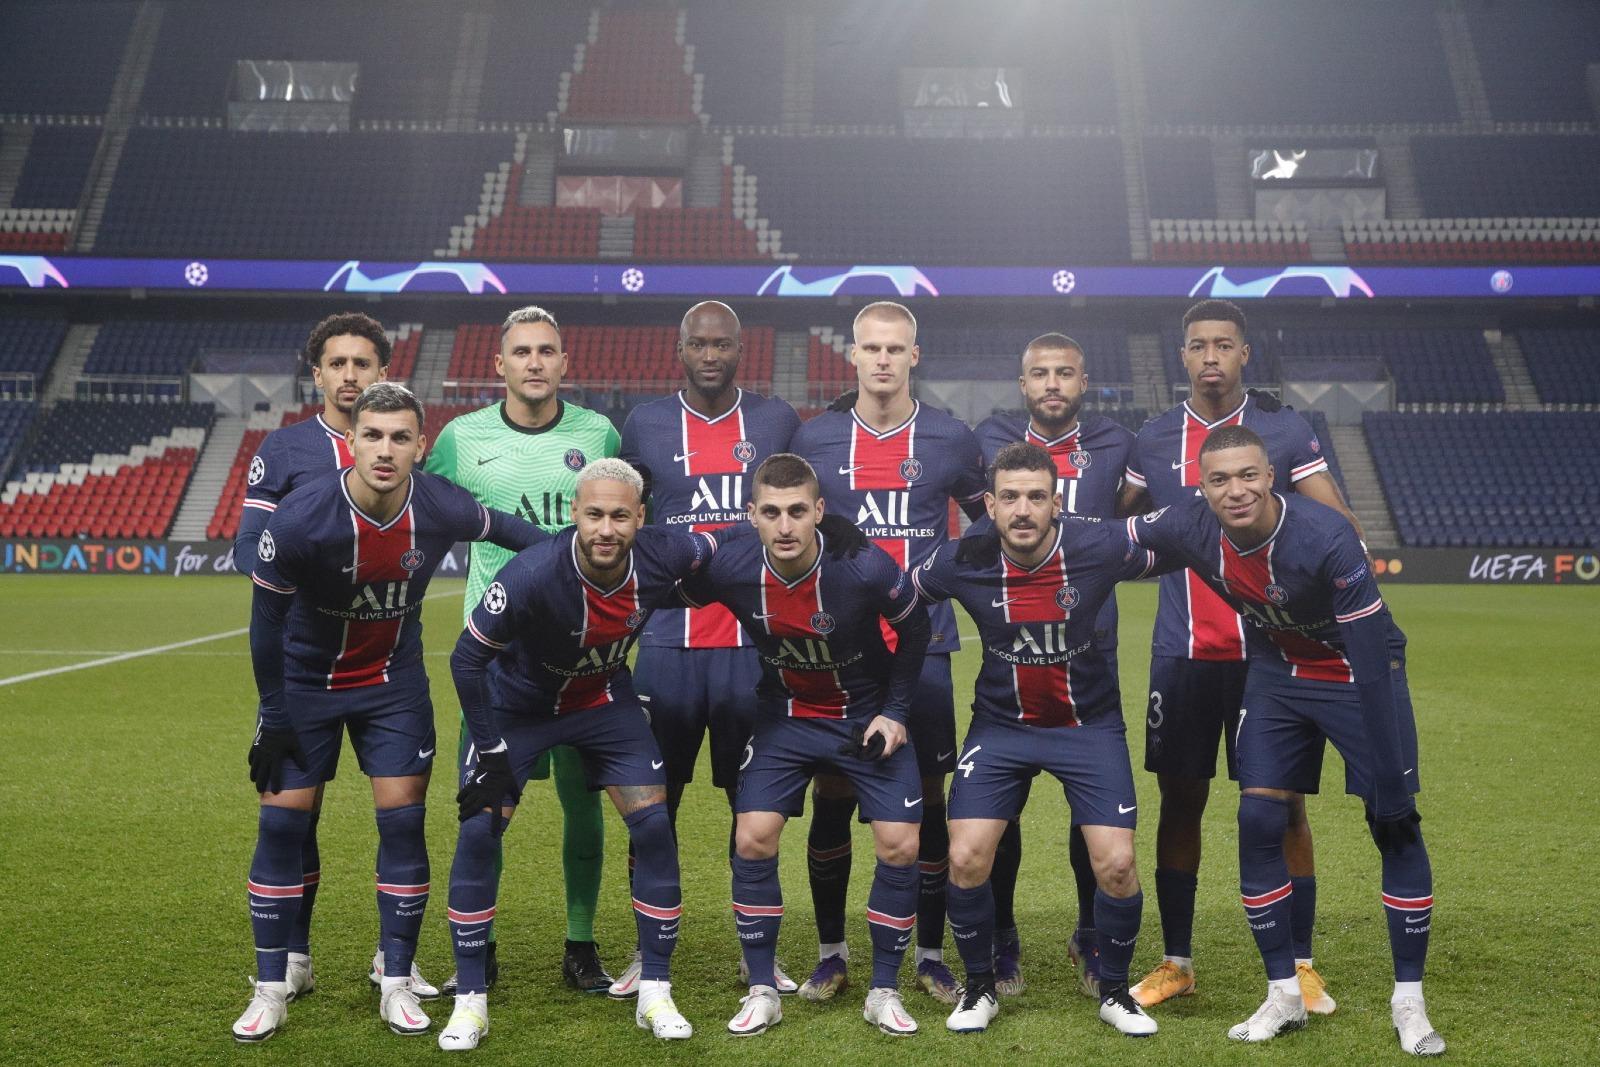 2021_PSG_IstanbulBasaksehir1_equipePSGPSG - Histoire du #PSG